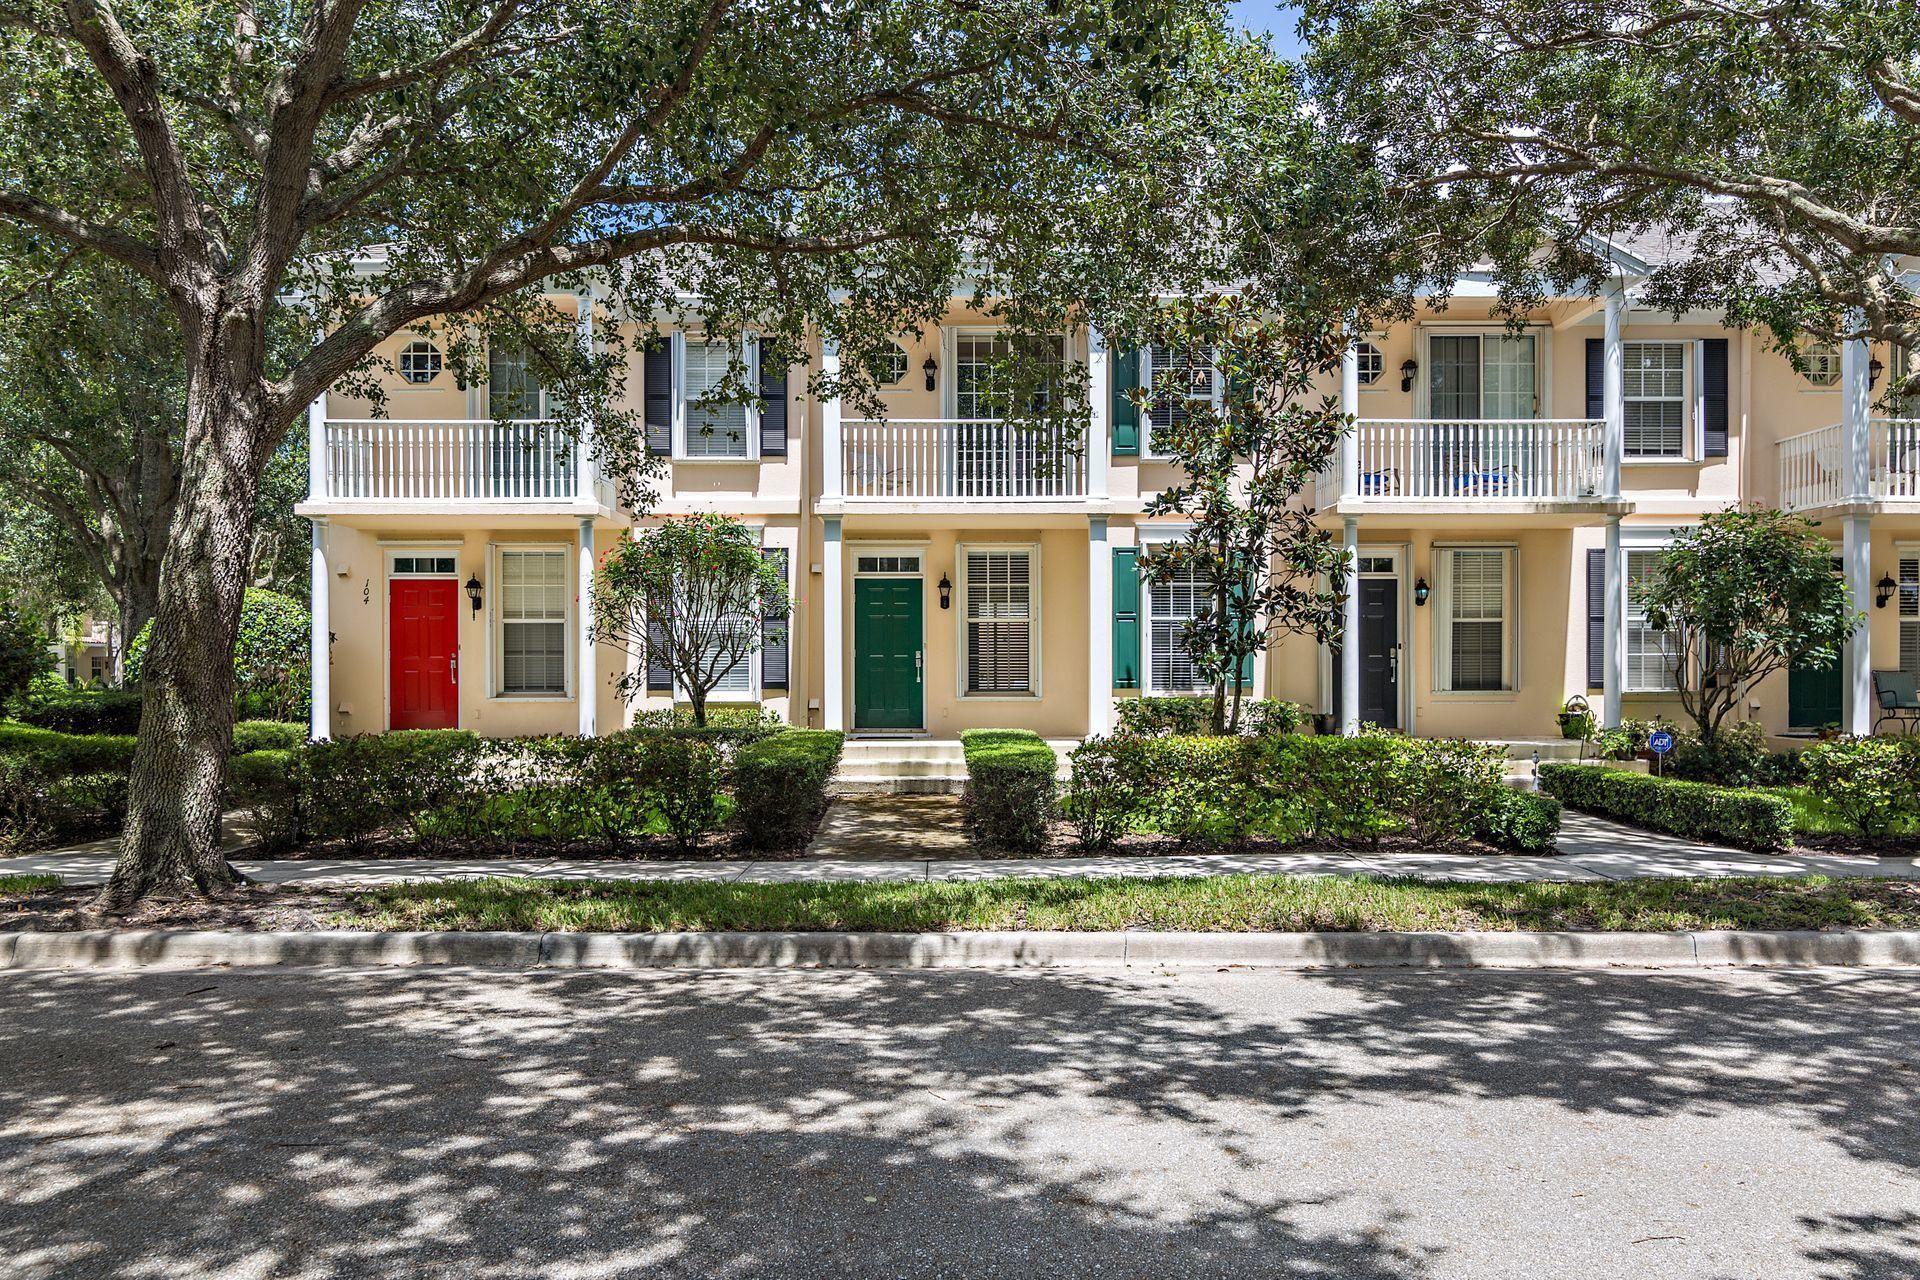 Photo of 106 Radcliffe Court, Jupiter, FL 33458 (MLS # RX-10636822)